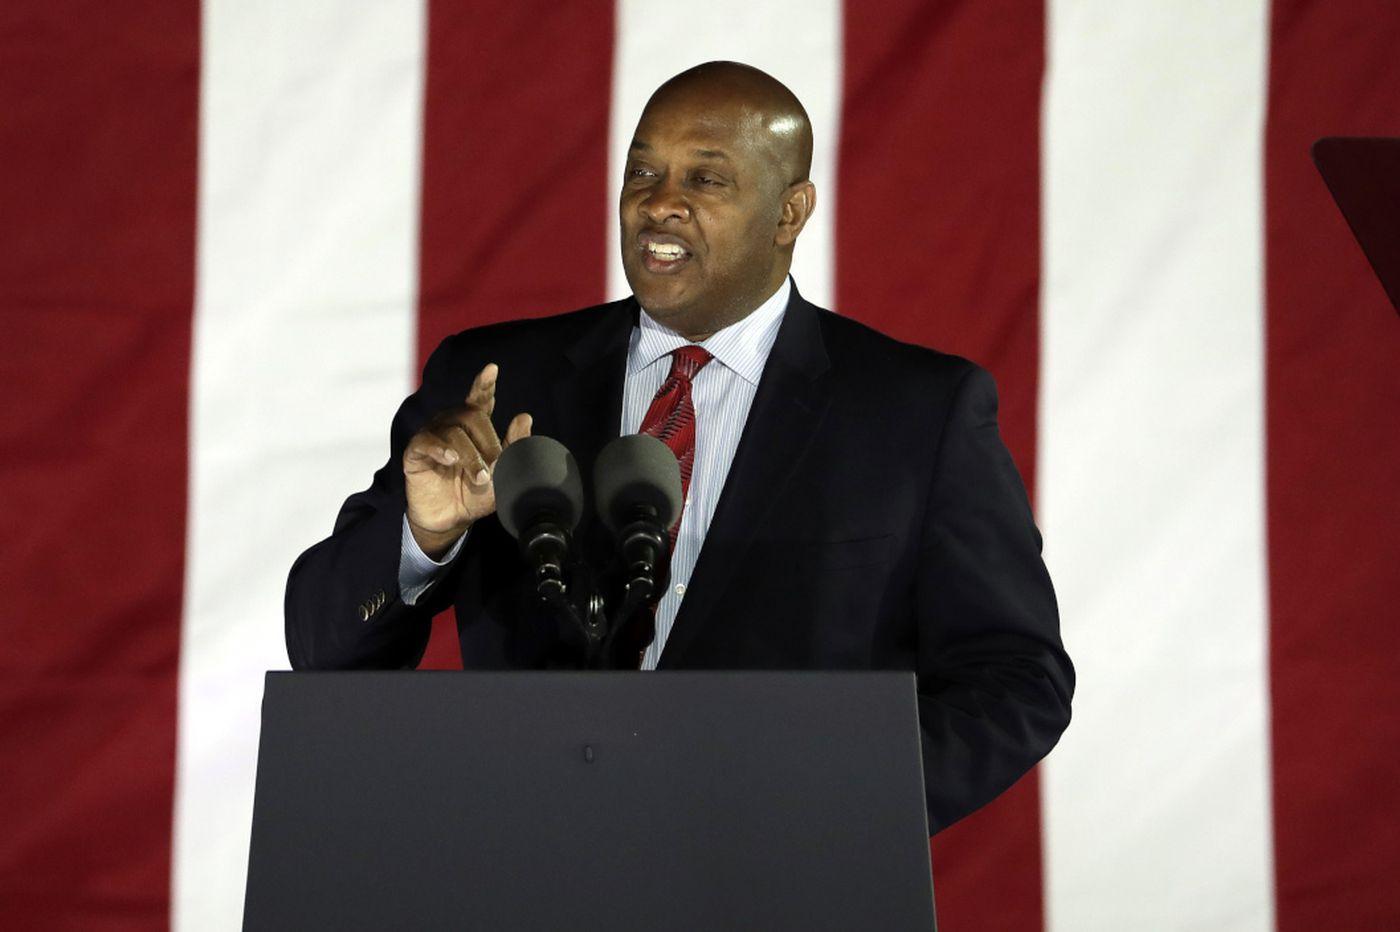 Dwight Evans wins Fattah's congressional seat